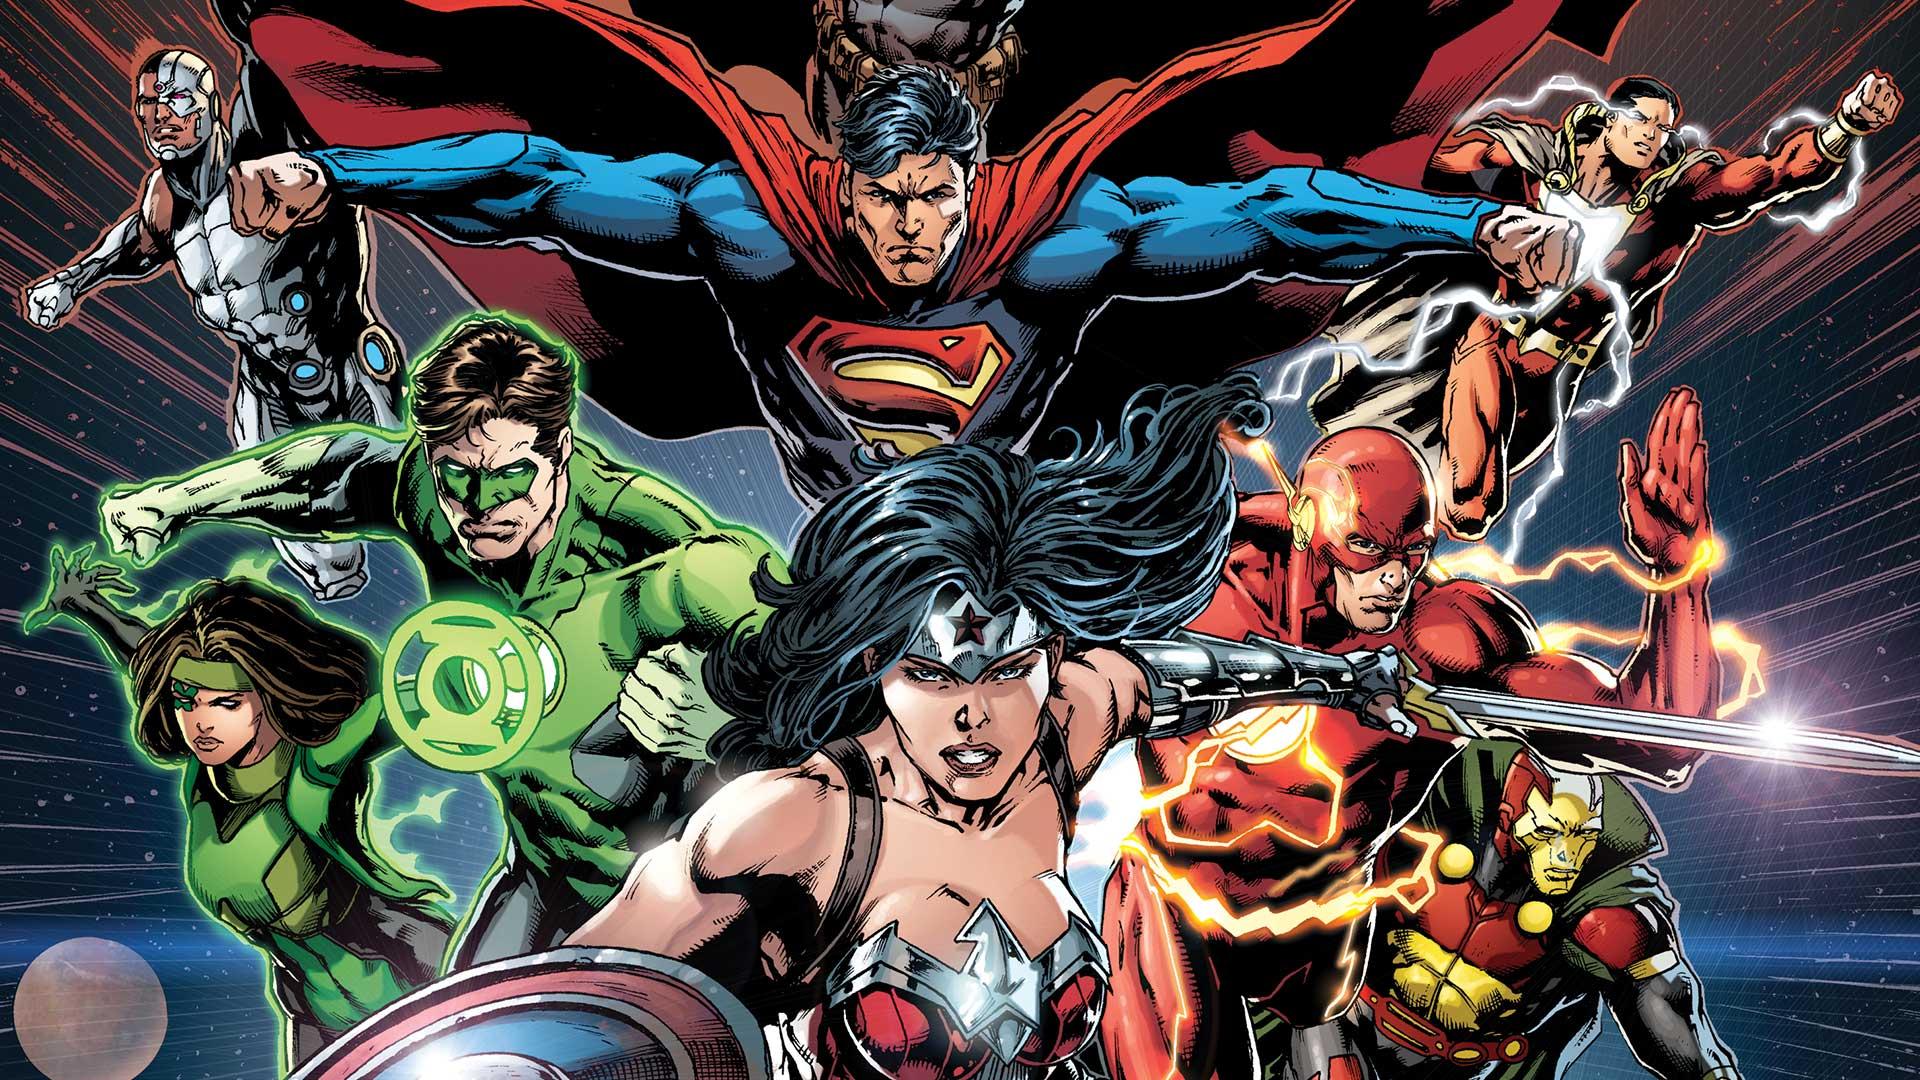 Justice League HD Wallpaper